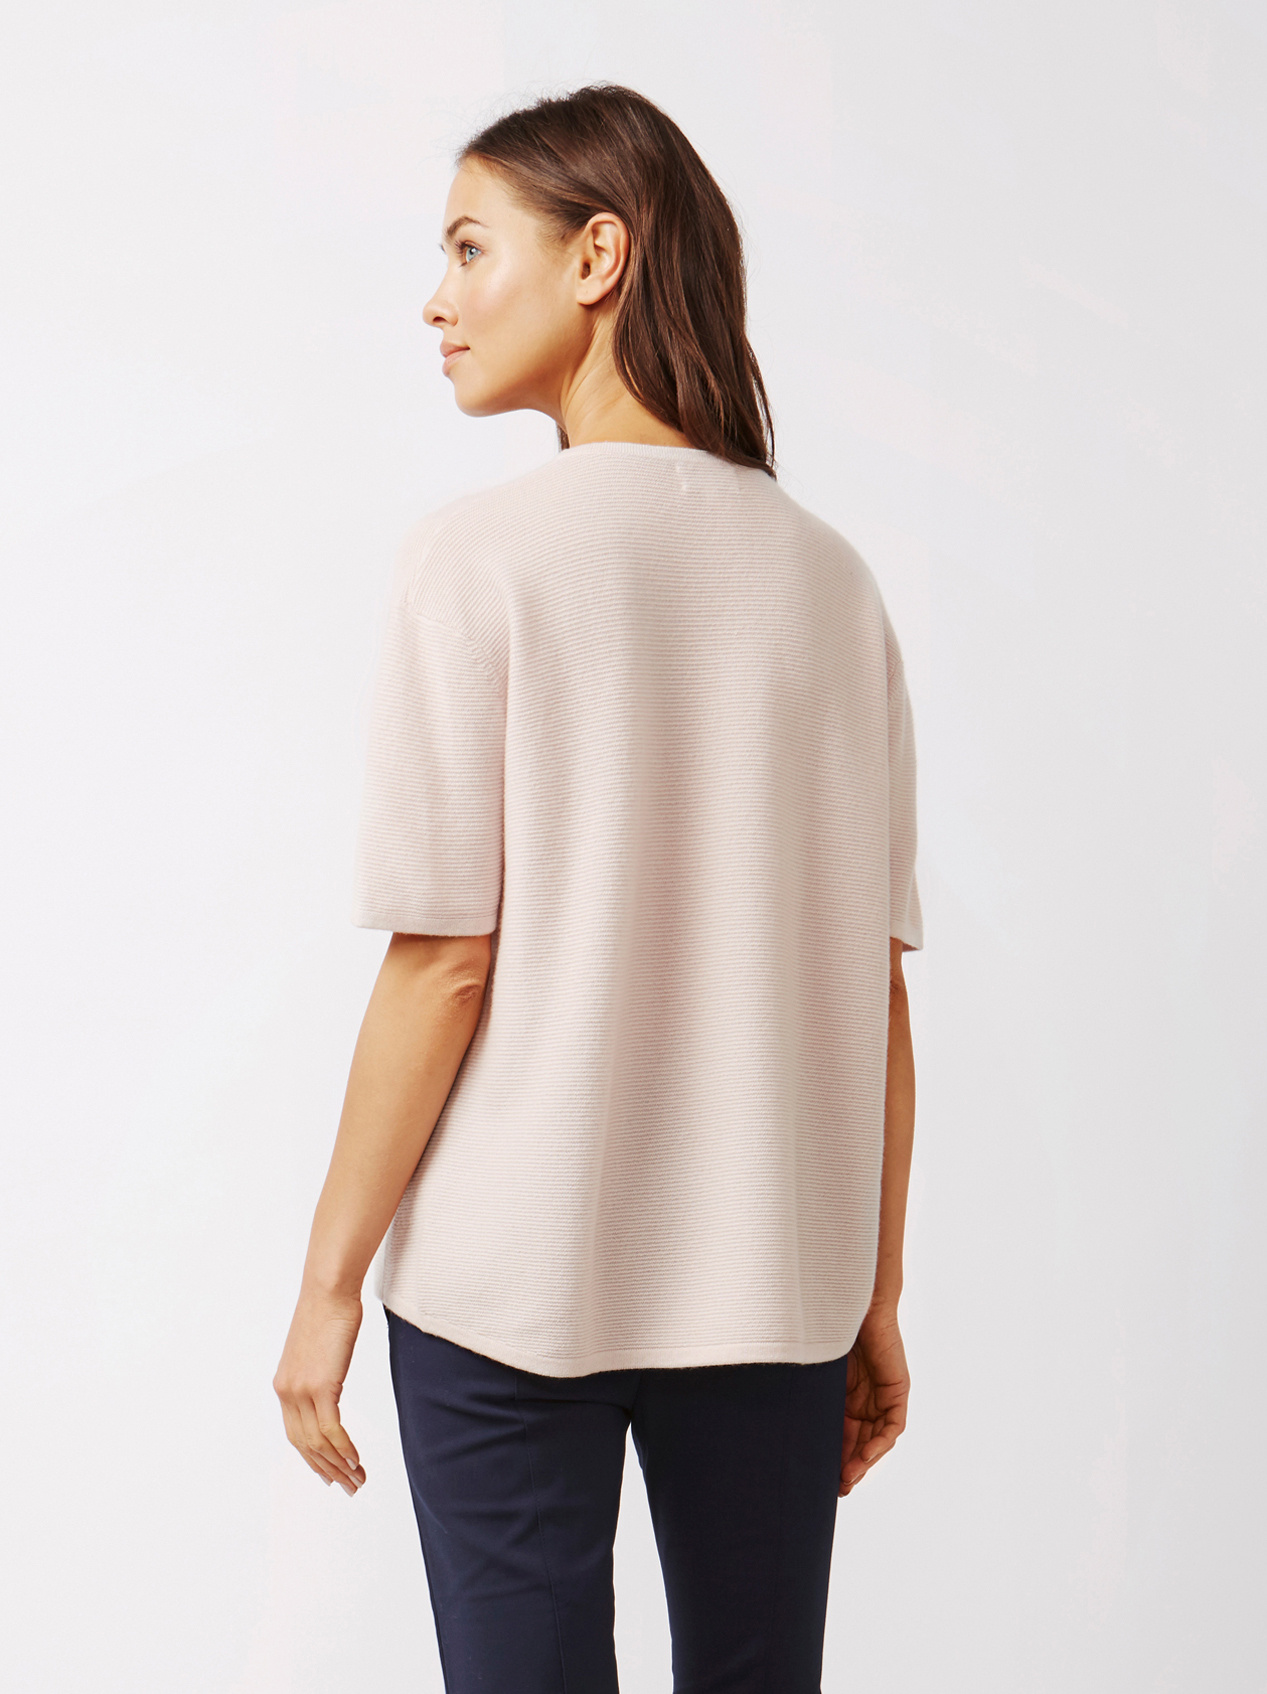 Soft Goat Women's Curved T-Shirt Marshmallow